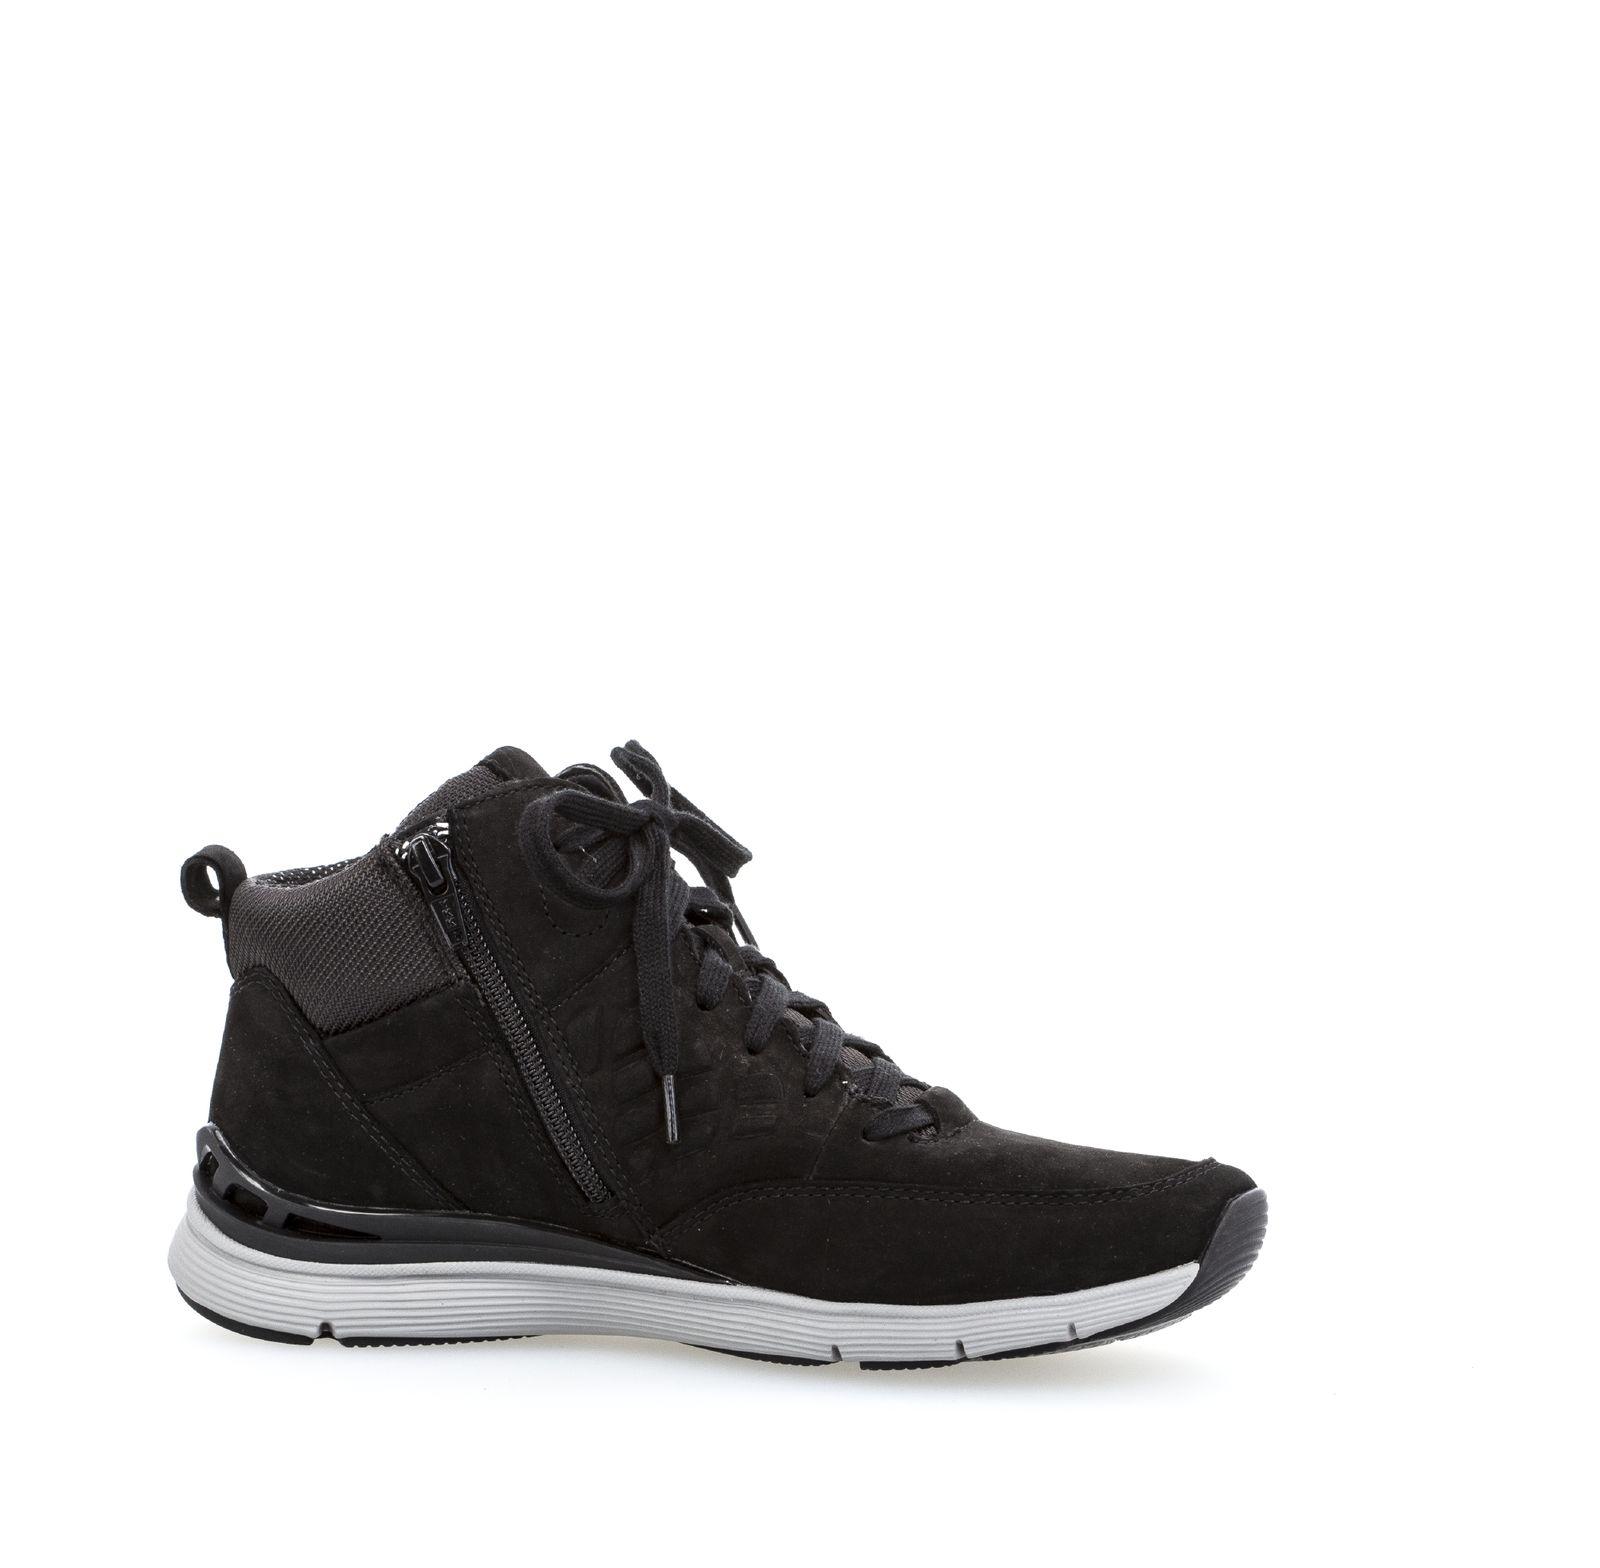 gabor damen sneaker mid schwarz damenschuhe sneaker. Black Bedroom Furniture Sets. Home Design Ideas